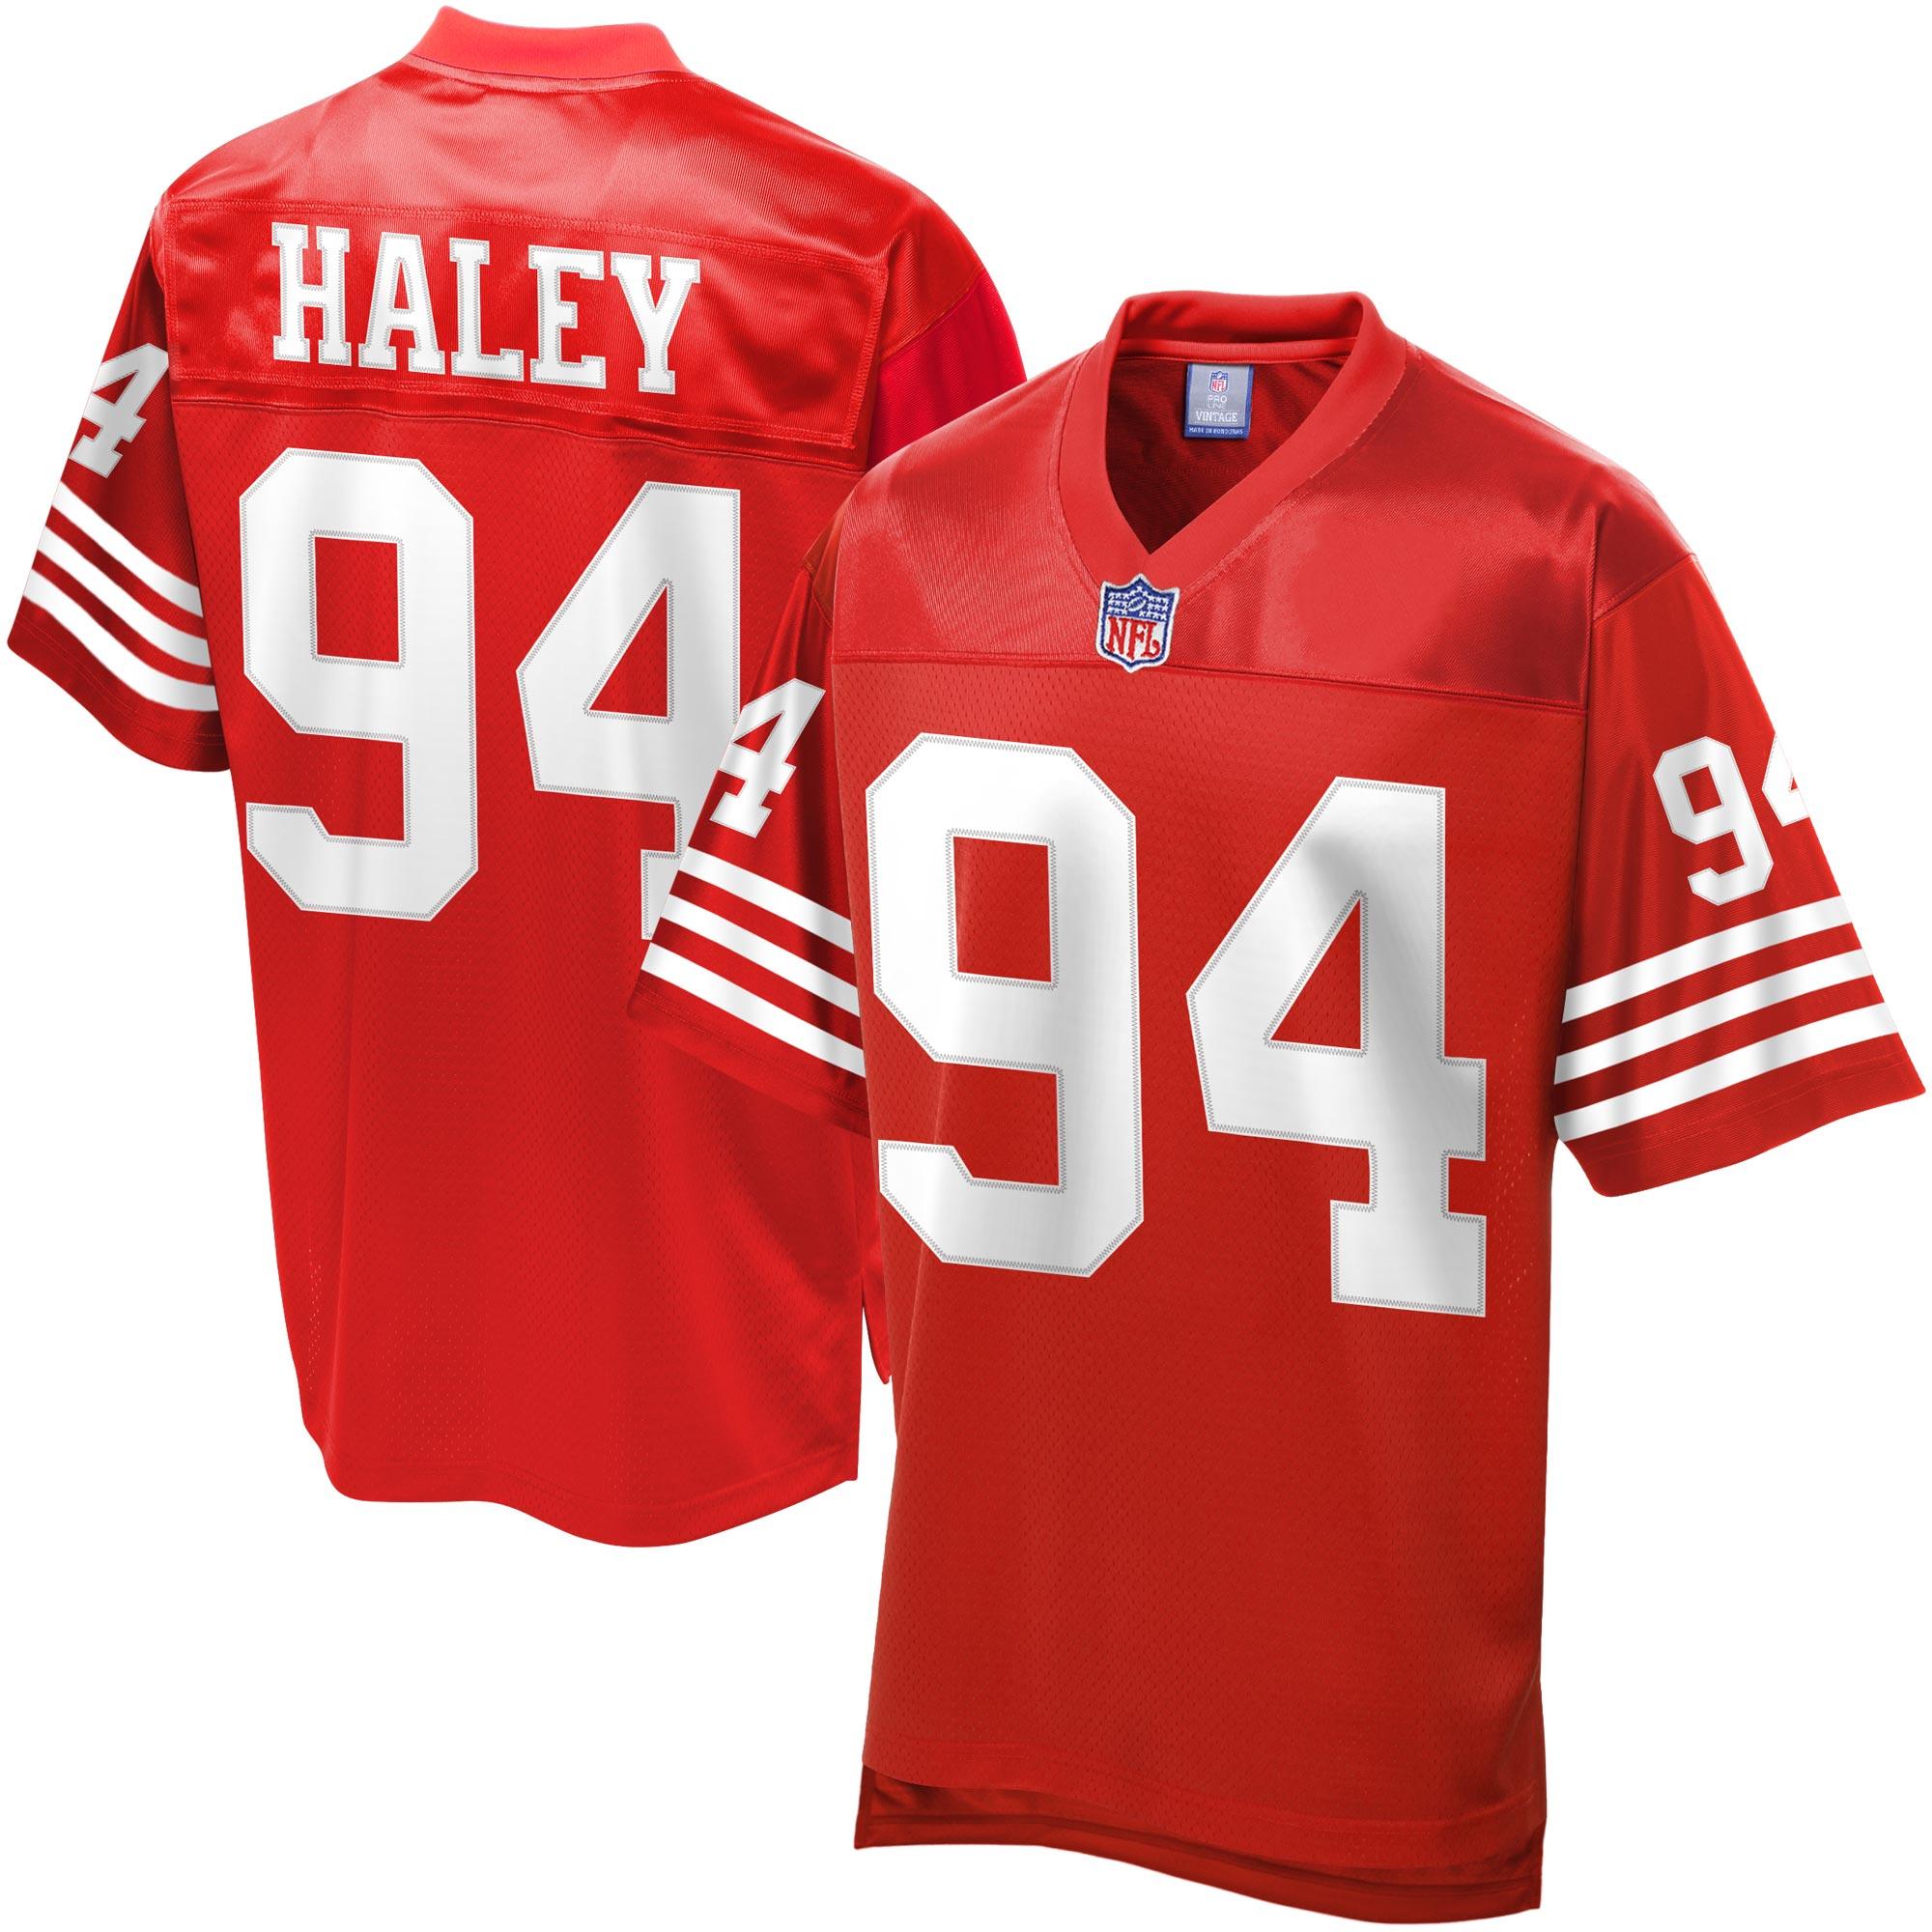 Charles Haley San Francisco 49ers NFL Pro Line Retired Player Jersey - Scarlet